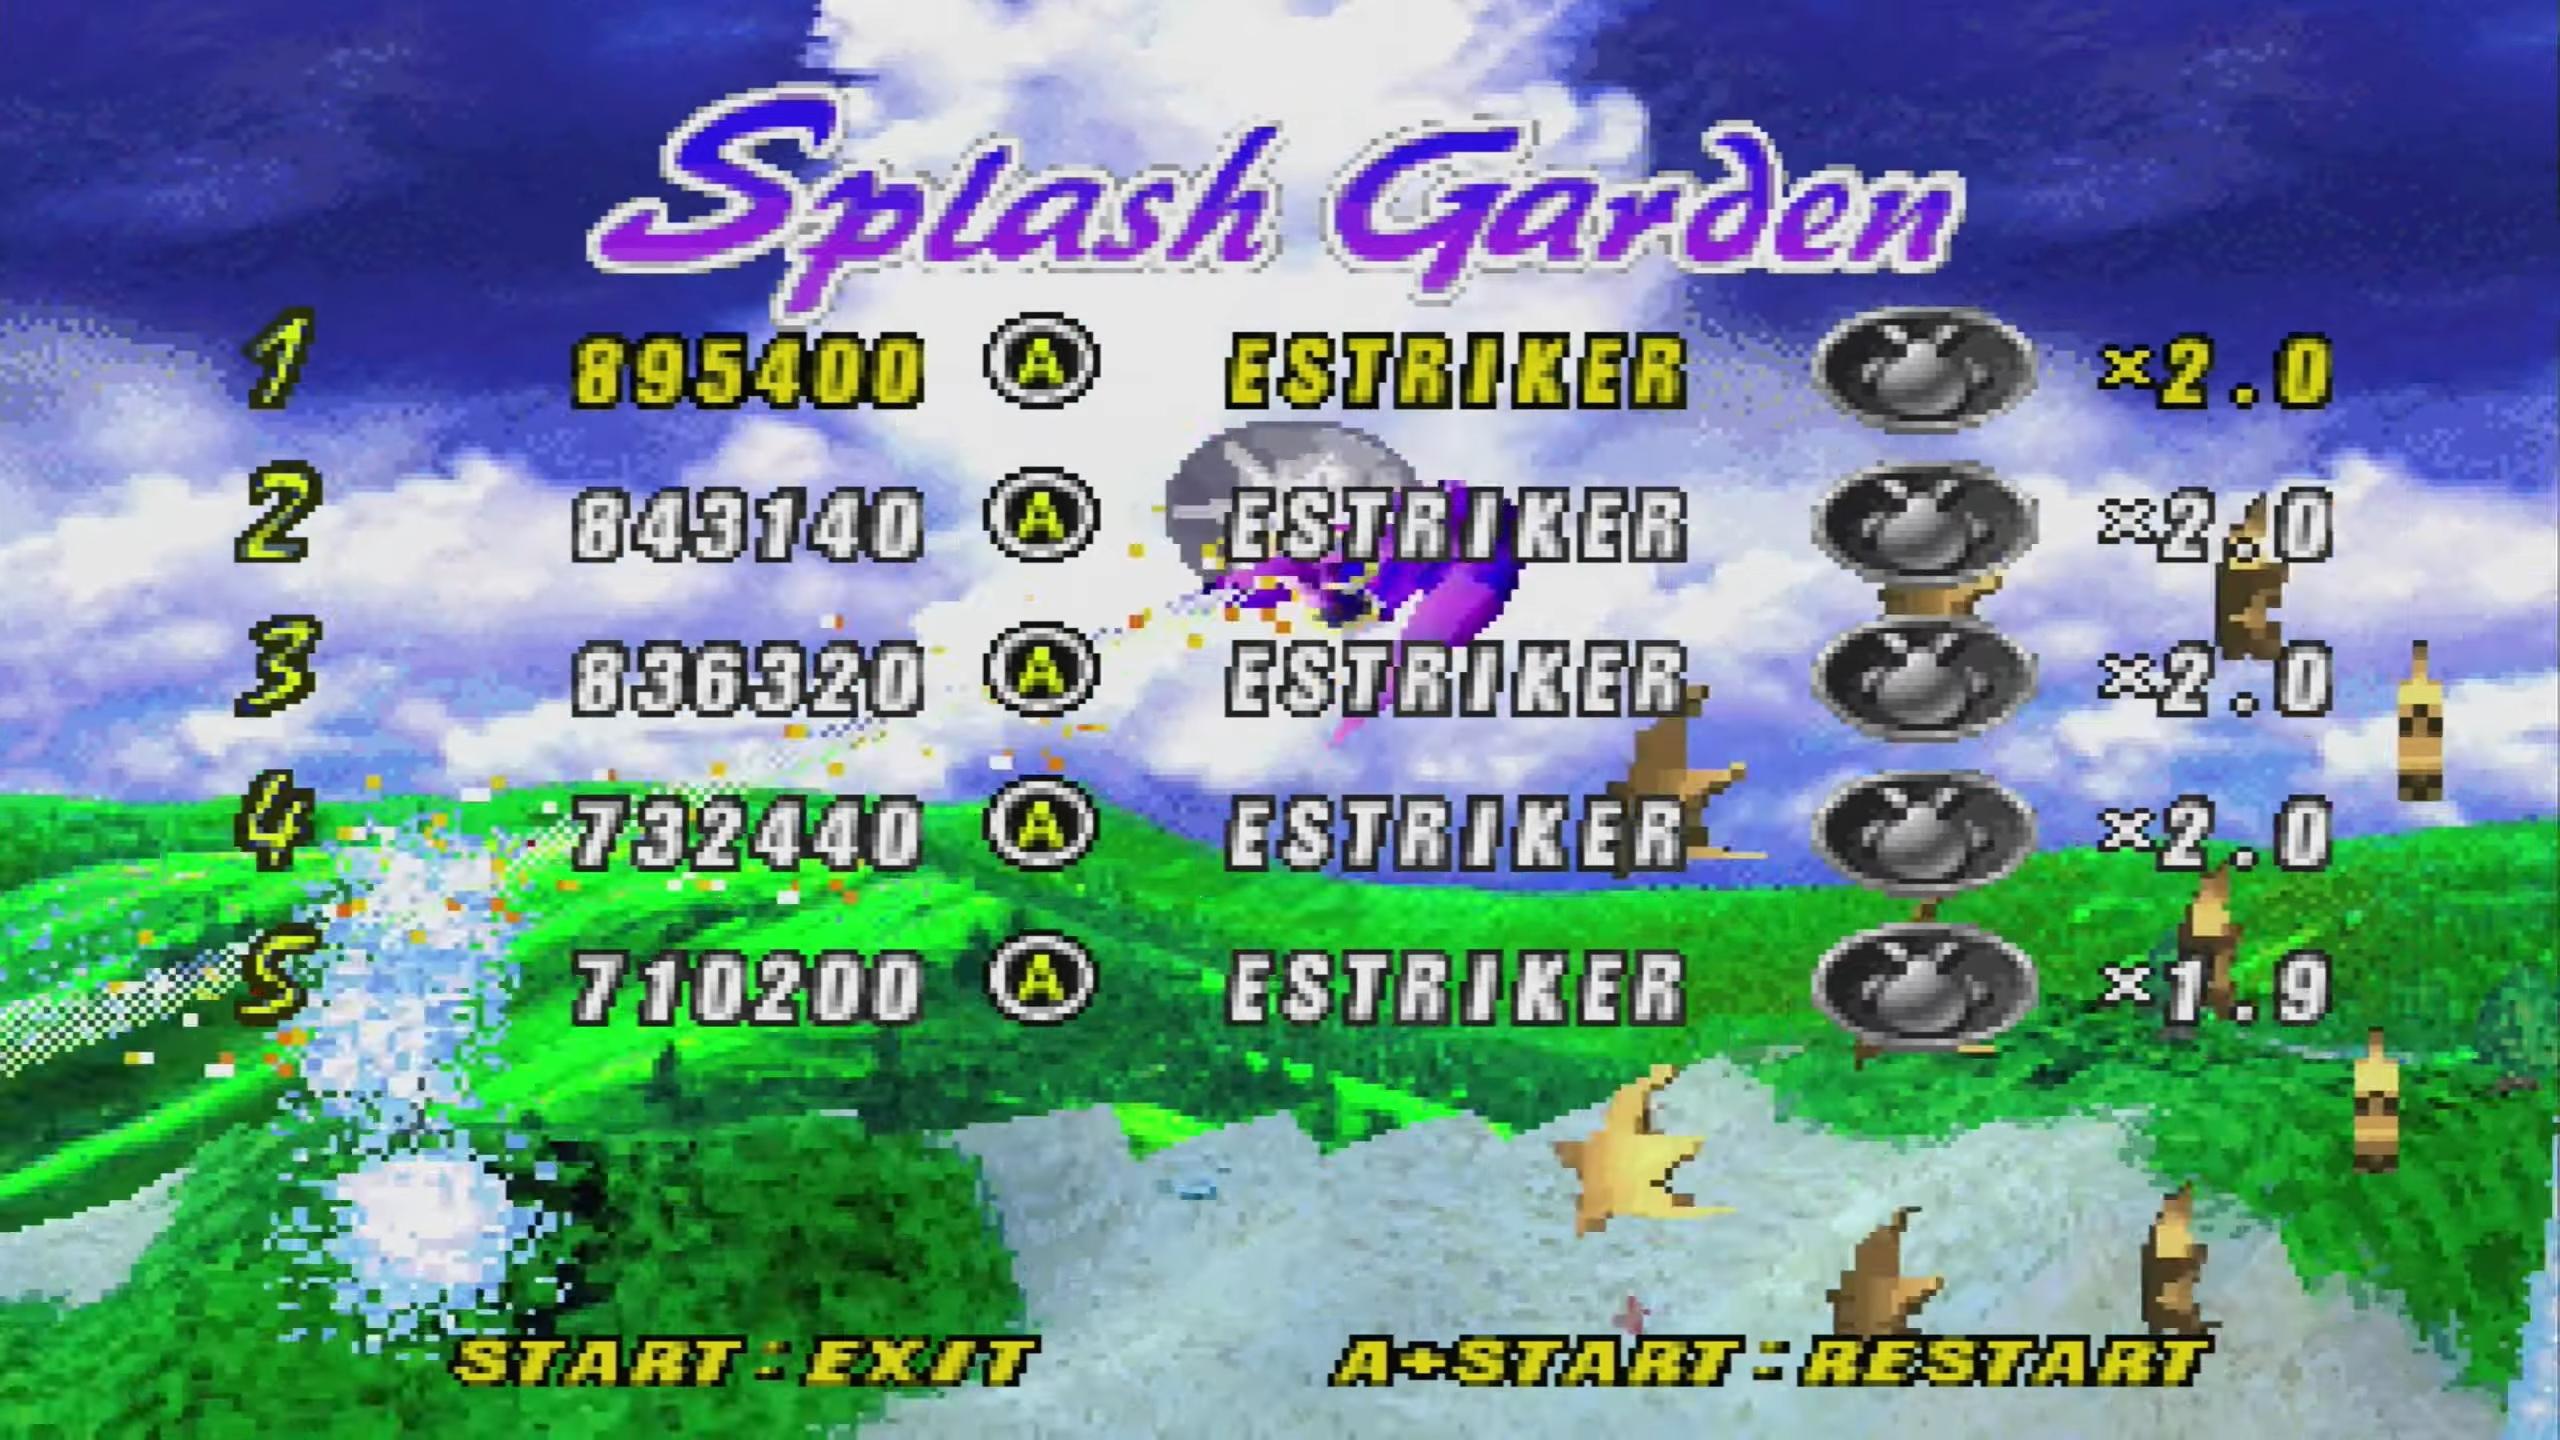 ElectricStriker: NiGHTS Into Dreams: Splash Garden (Sega Saturn) 895,400 points on 2019-01-17 17:09:01